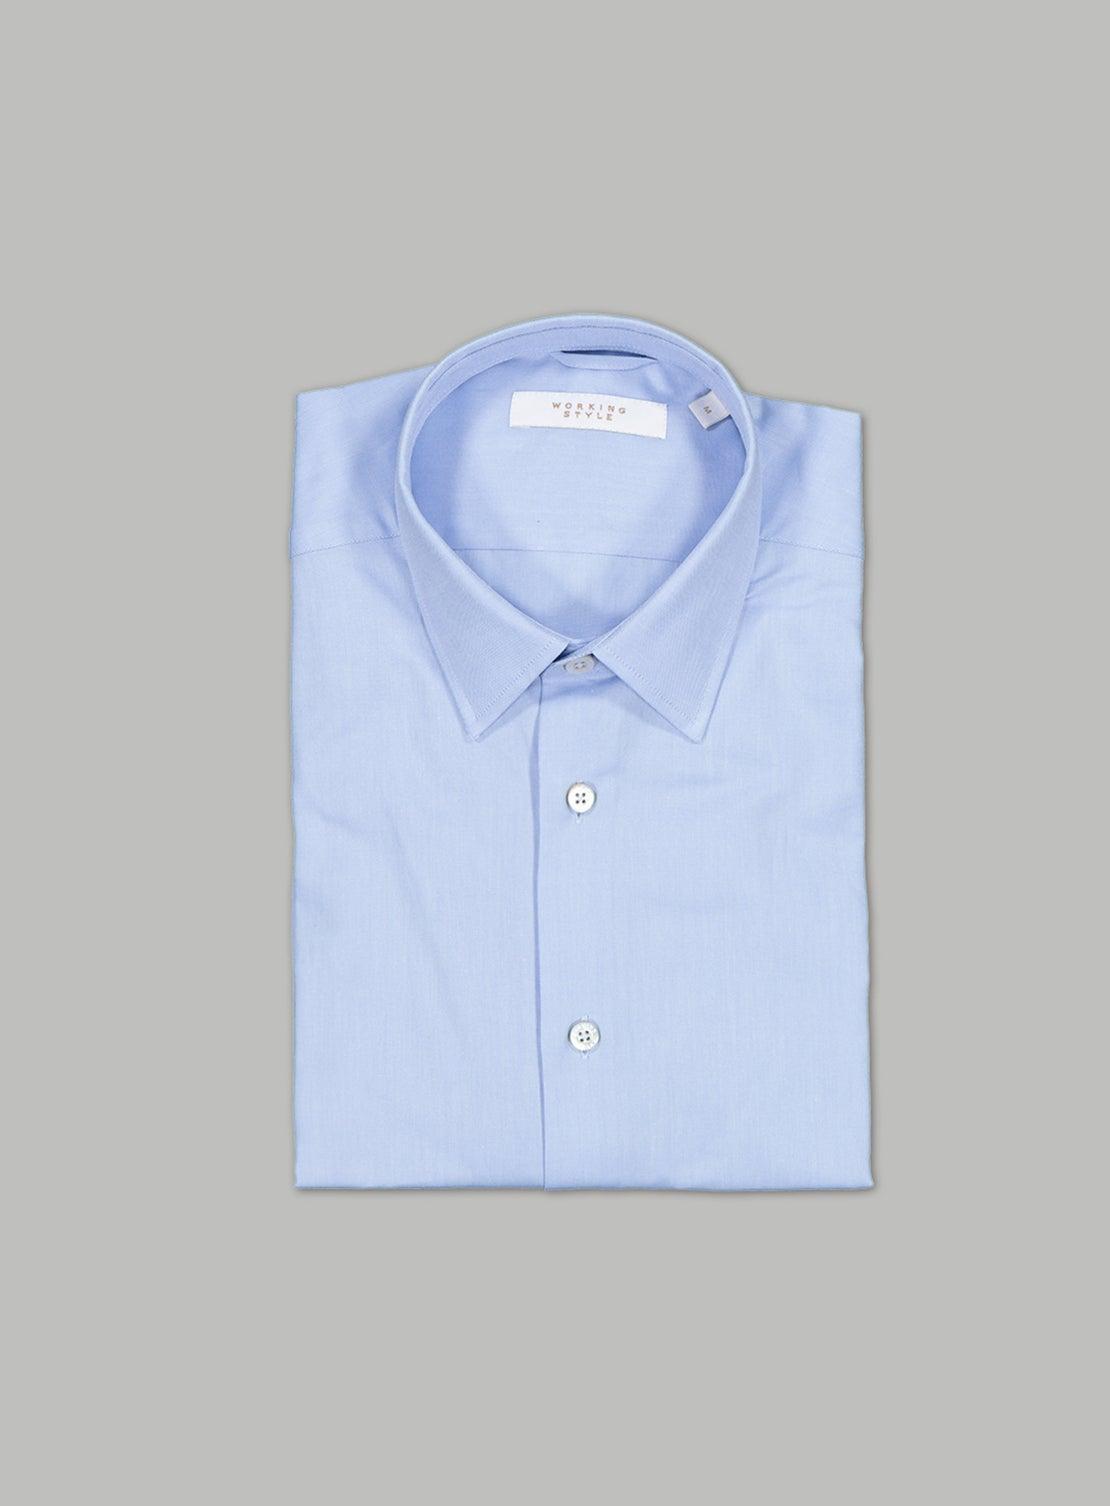 Pale Blue Oxford Shirt